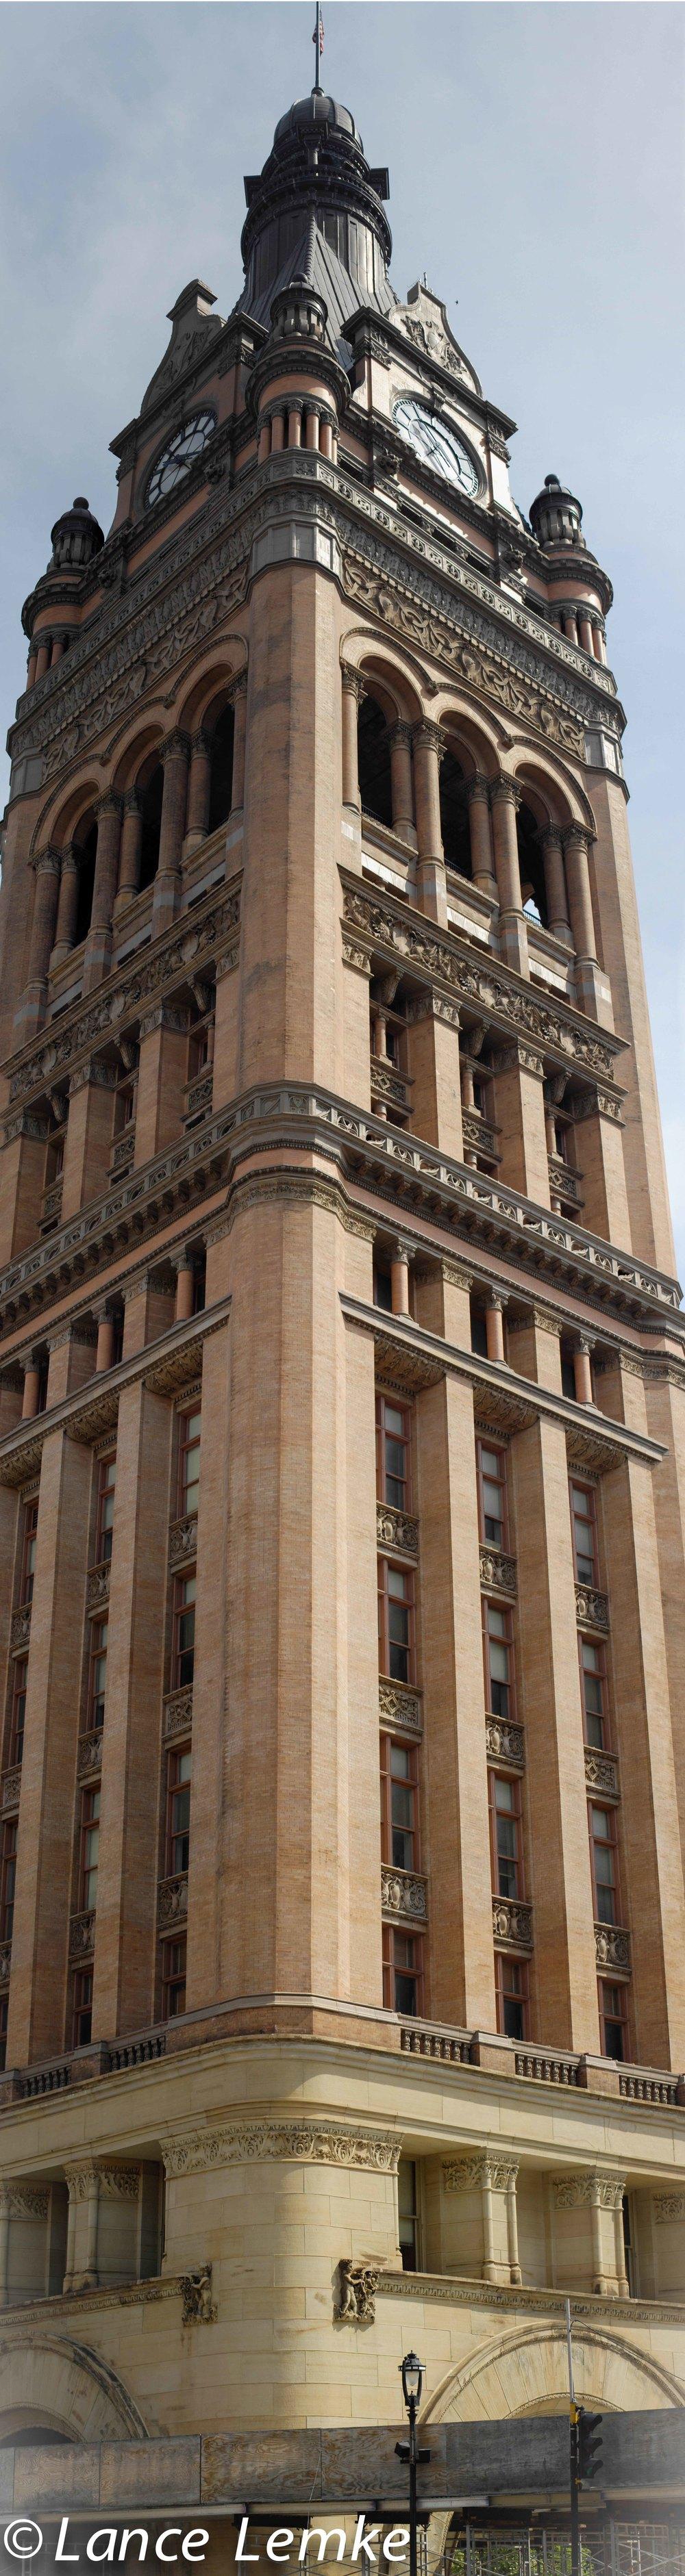 Milwaukee City Hall, Downtown Milwaukee. Build 1895